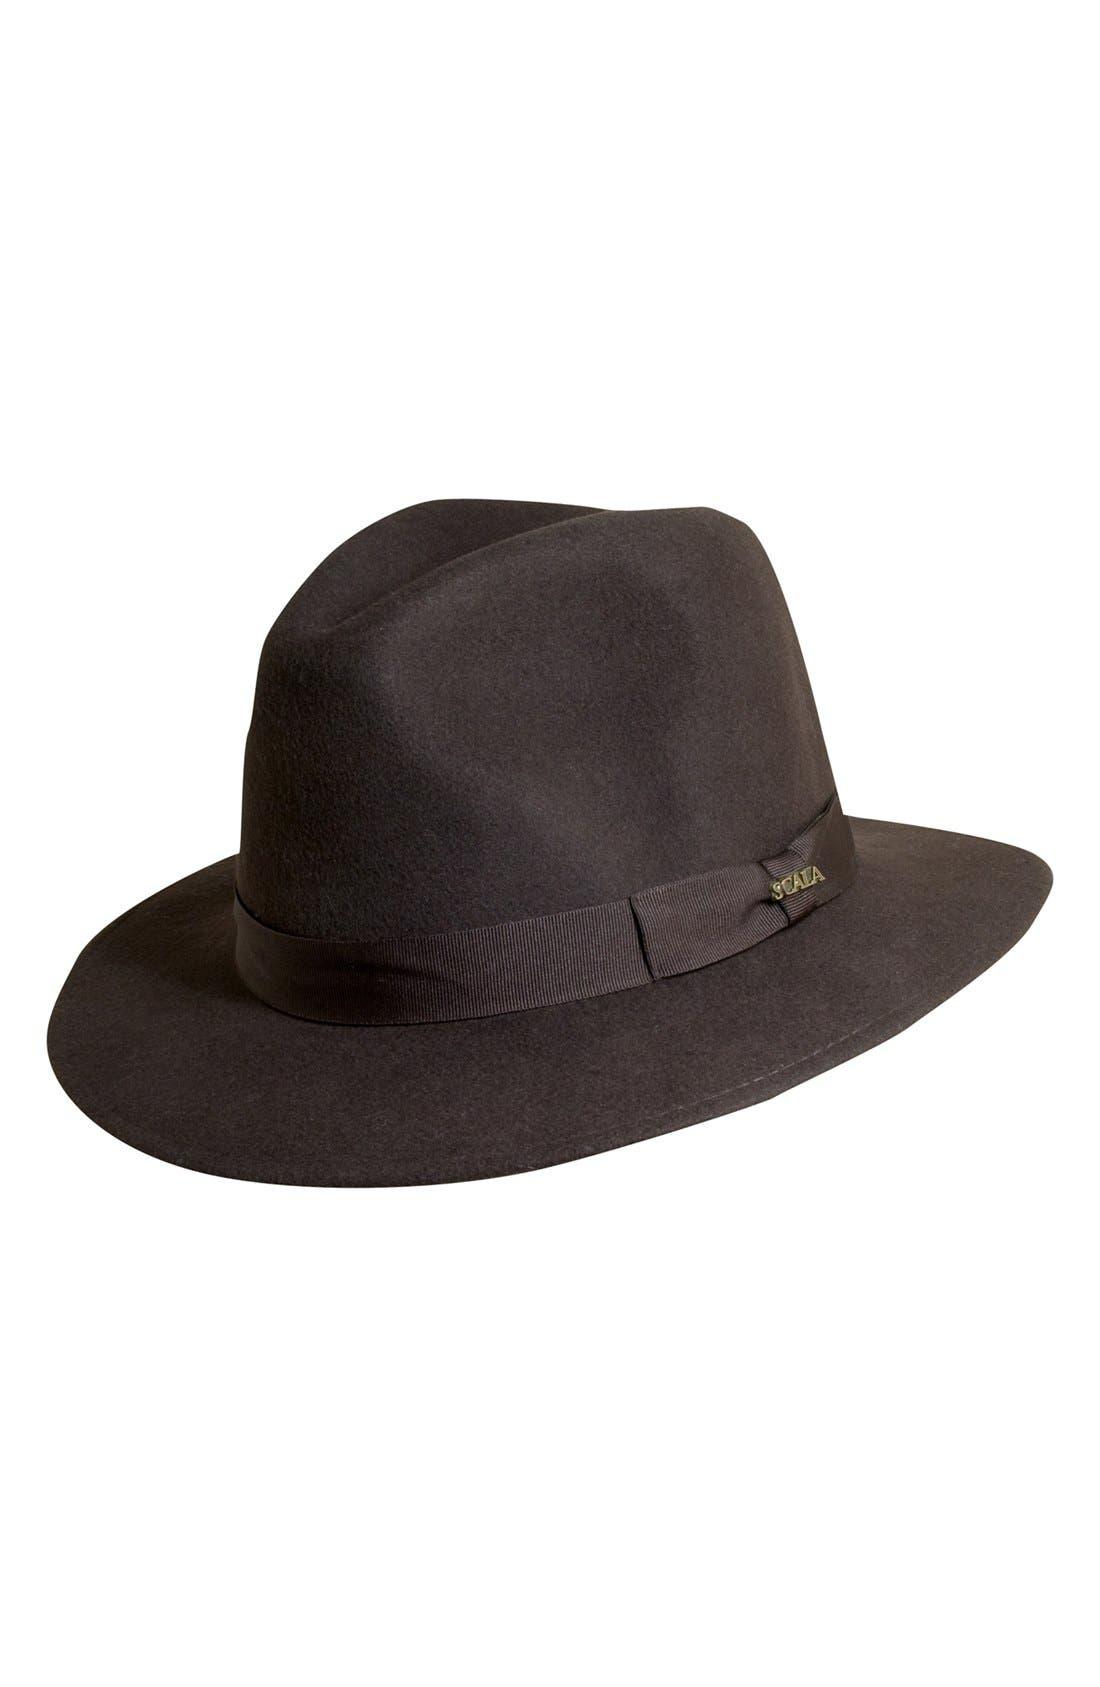 Alternate Image 1 Selected - Scala 'Classico' Crushable Felt Safari Hat